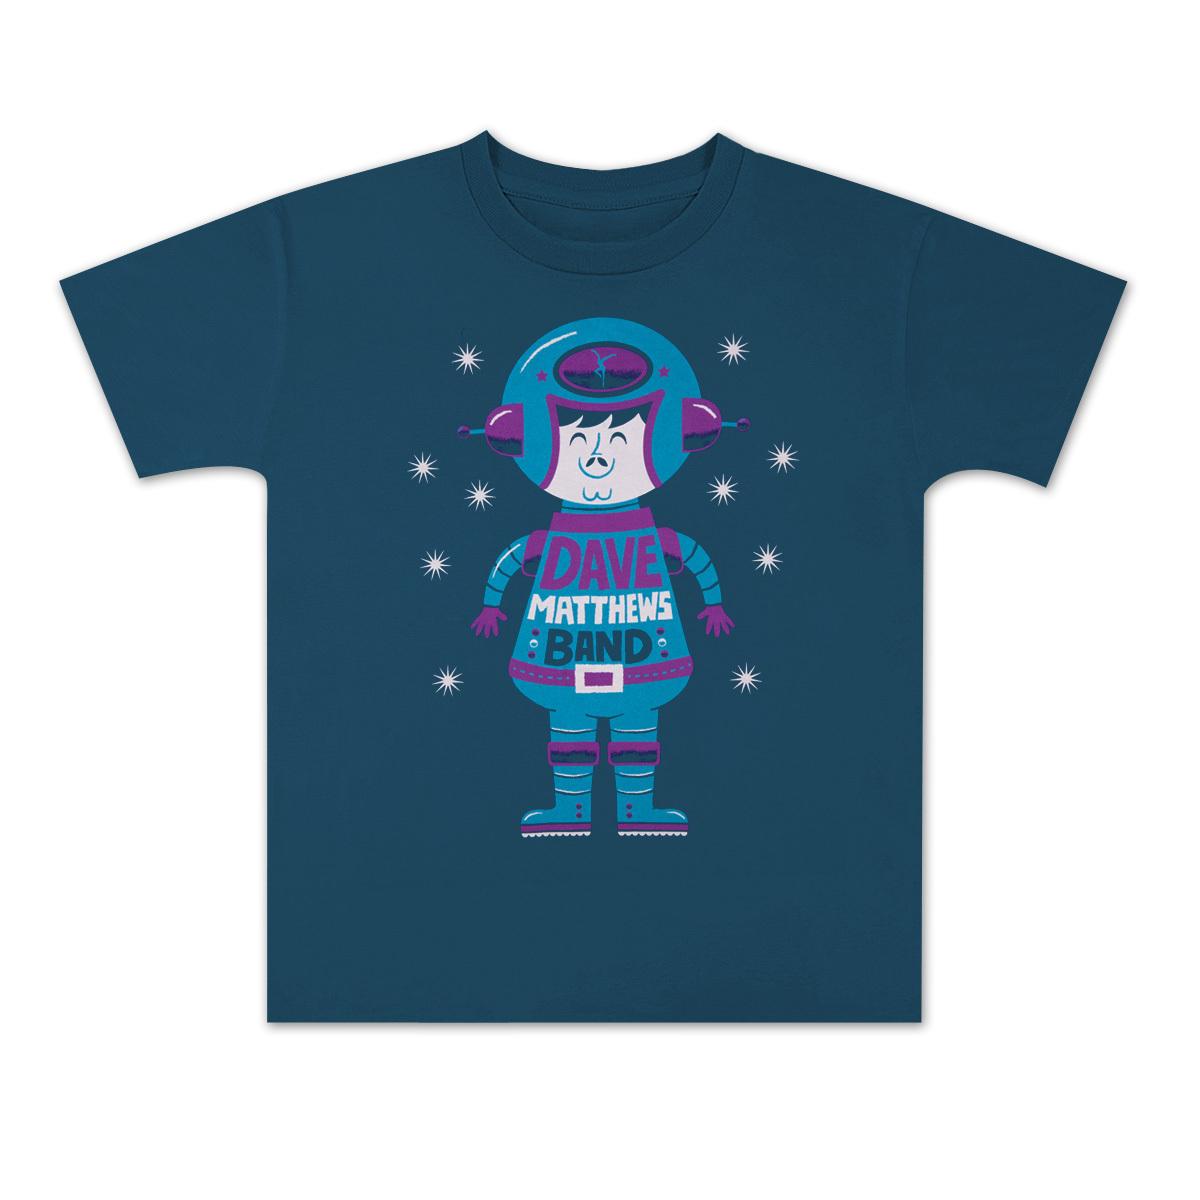 DMB 2013 Kids Spaceman Tee